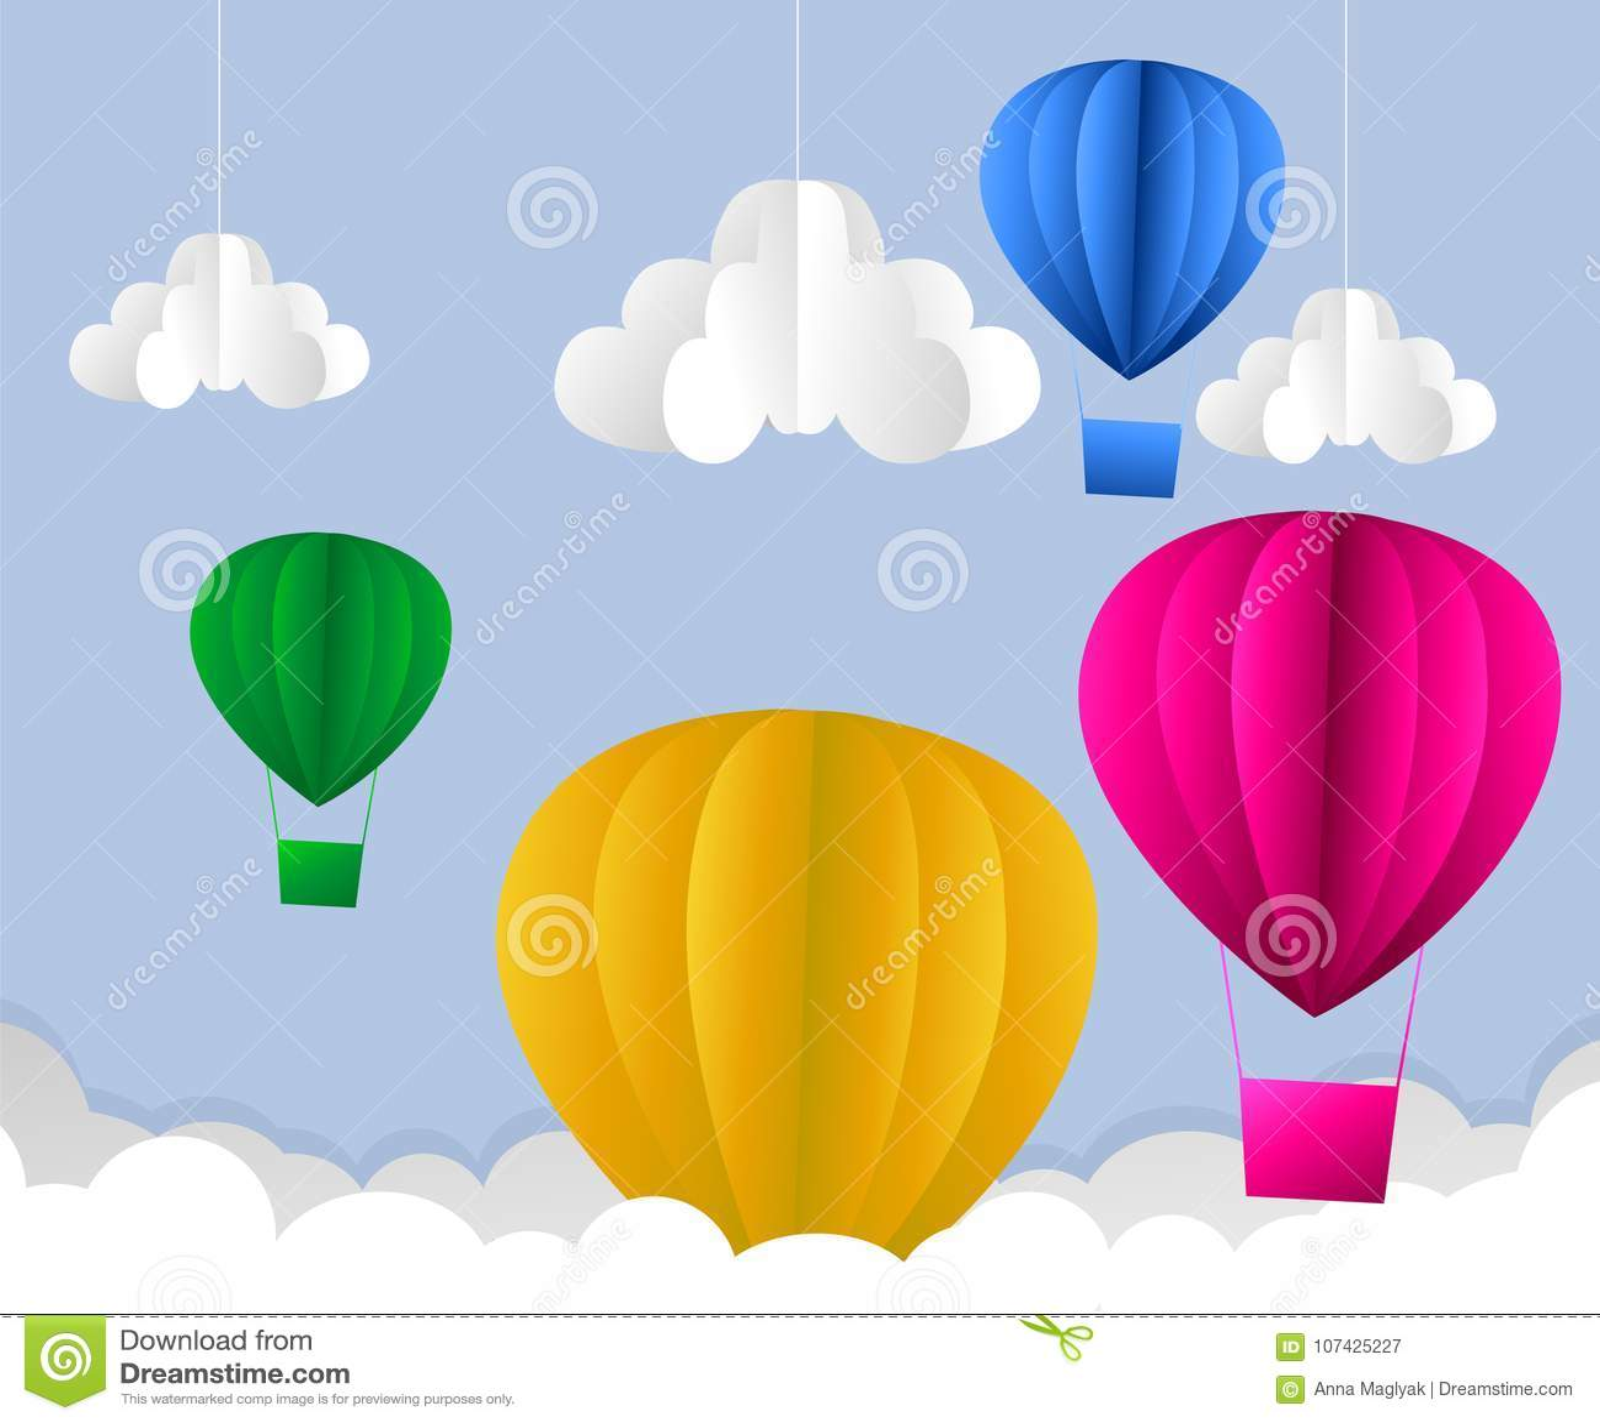 Illustration of clouds suns and hot air balloon origami flying on illustration of clouds suns and hot air balloon origami flying on the sky on the skyper art style jeuxipadfo Choice Image